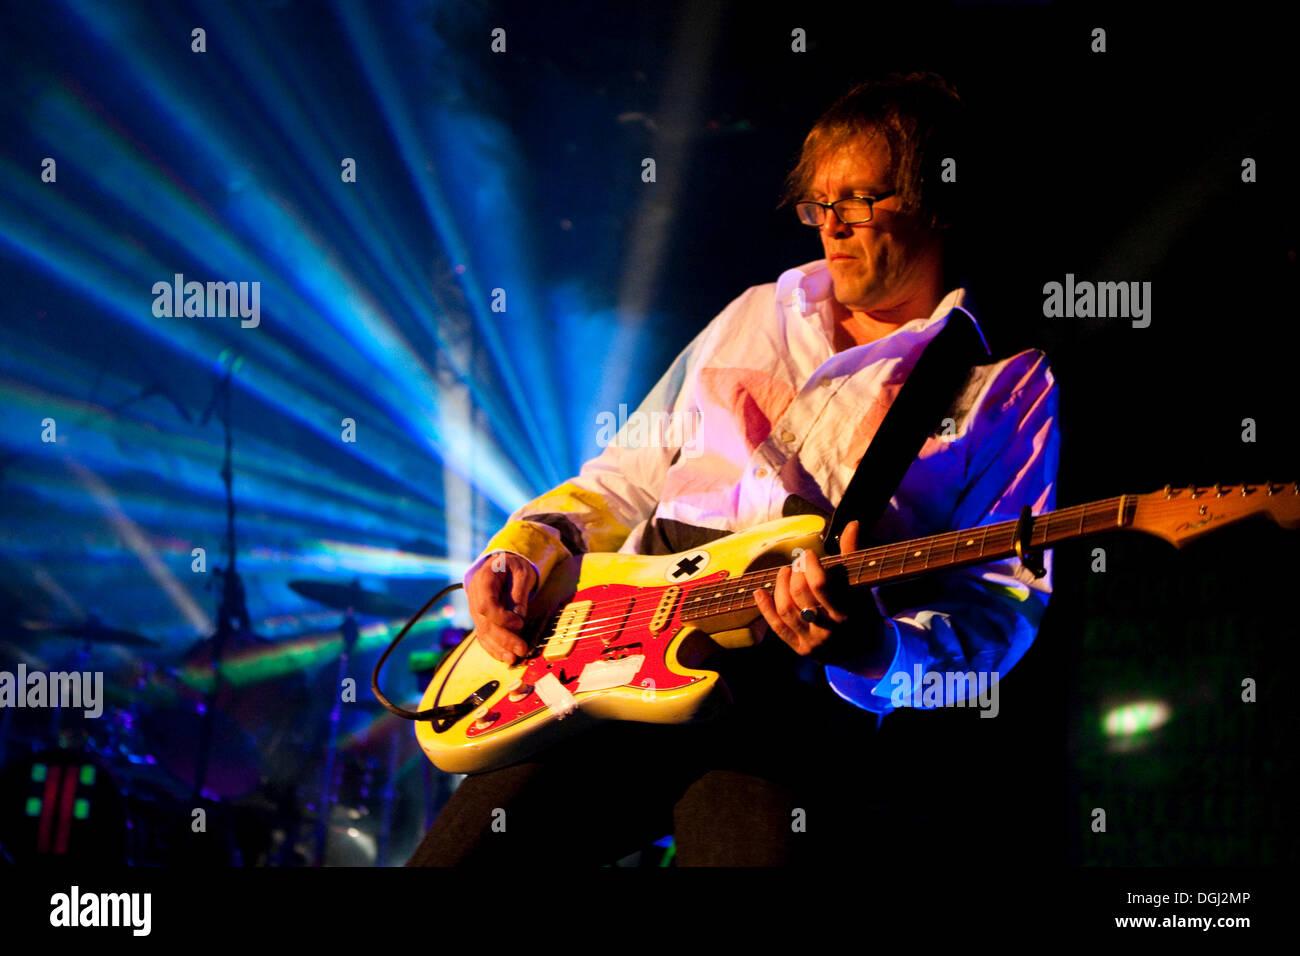 Uwe Jahnke, guitarist of the German band Fehlfarben live in the Schueuer venue, Lucerne, Switzerland - Stock Image